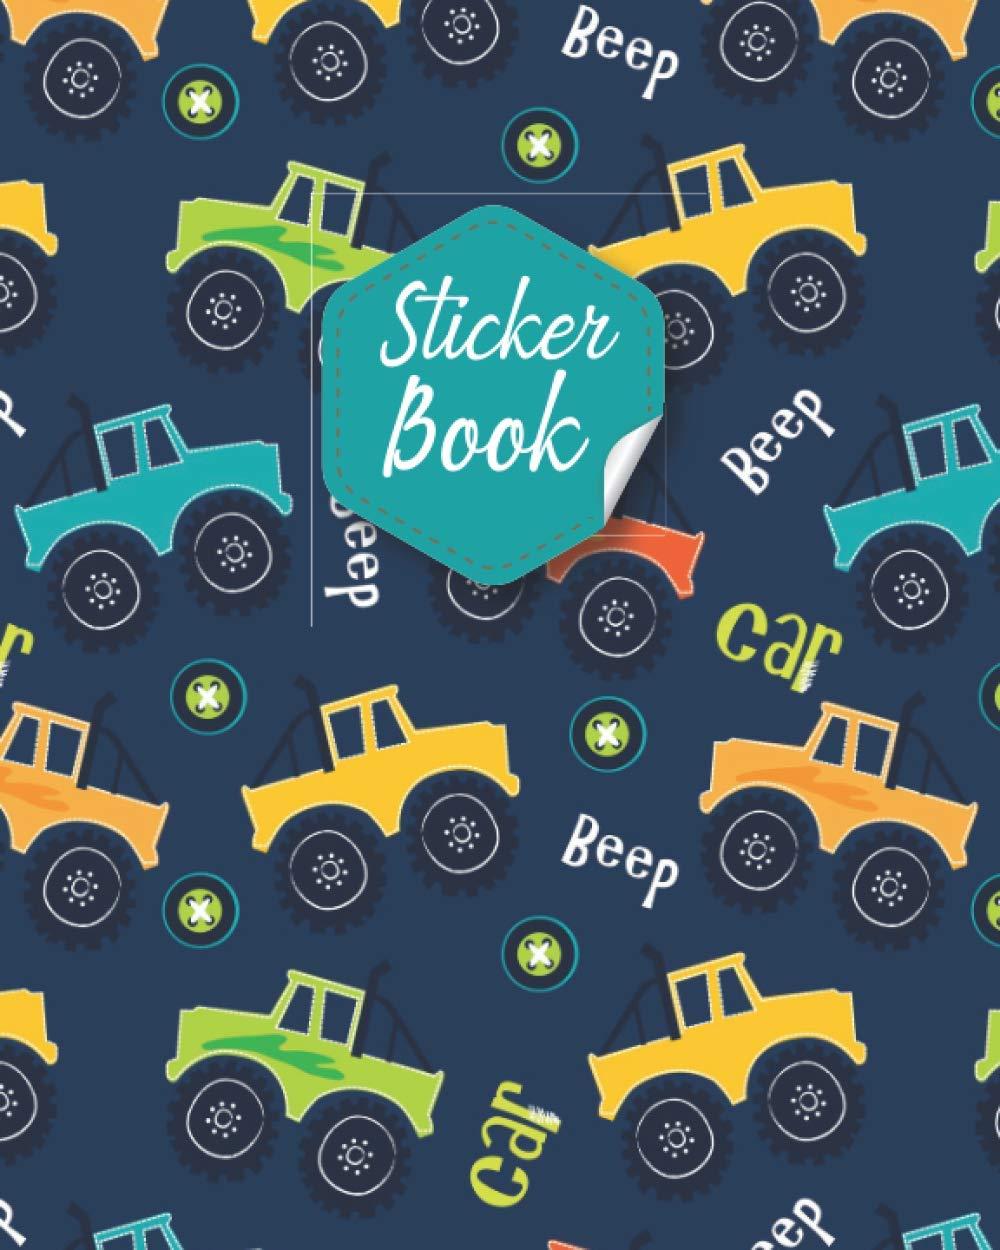 Sticker Book: Kids Sticker Collection Book & Blank Sticker Album also Blank Sticker Collecting Album for Kids, Children, Boys & Girls Sticker ... on their Own Sticker Books for Kids 100 pages